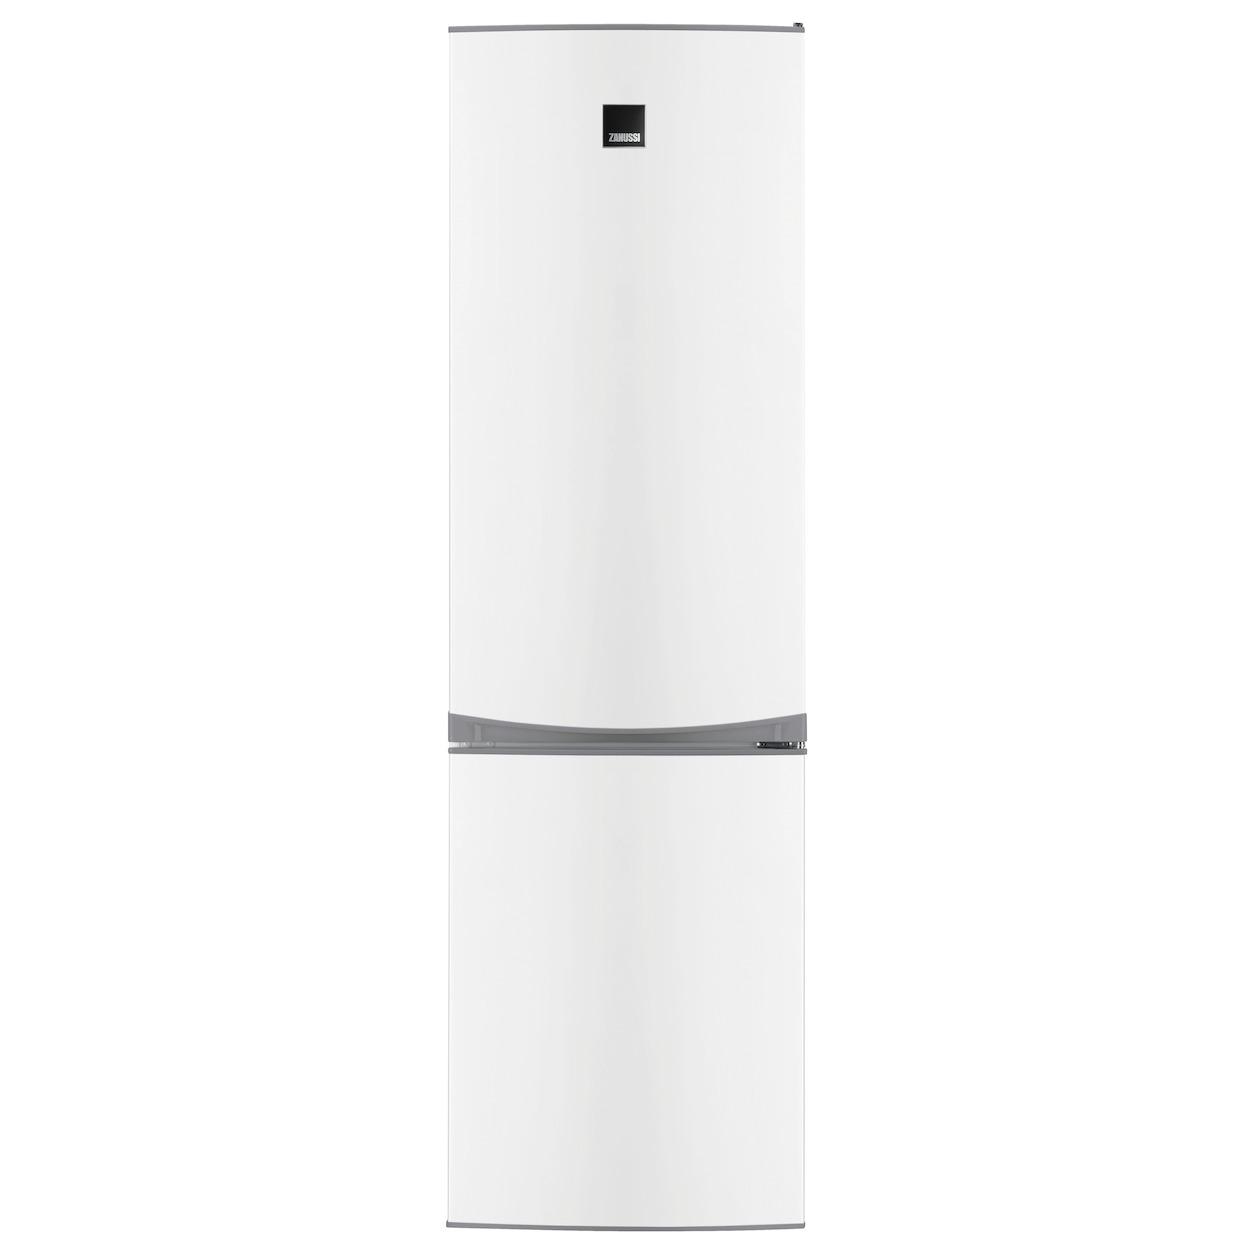 Zanussi koelkast met vriesvak ZRB34103WA - Prijsvergelijk